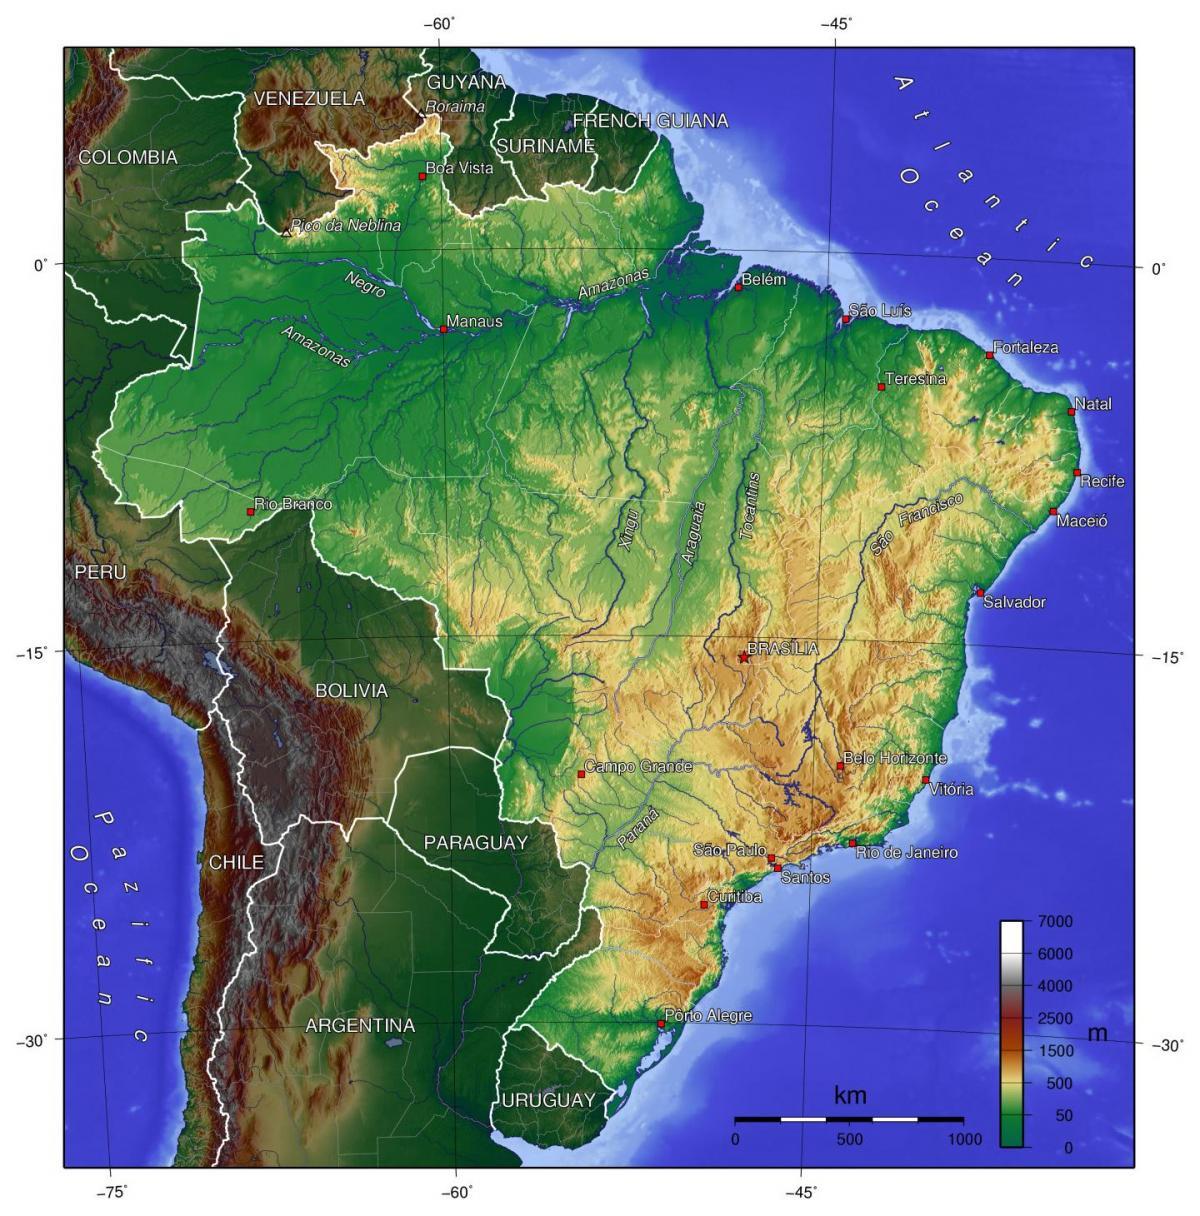 topographische karte brasilien Brasilien topographische Karte   Topographische Karte Brasilien